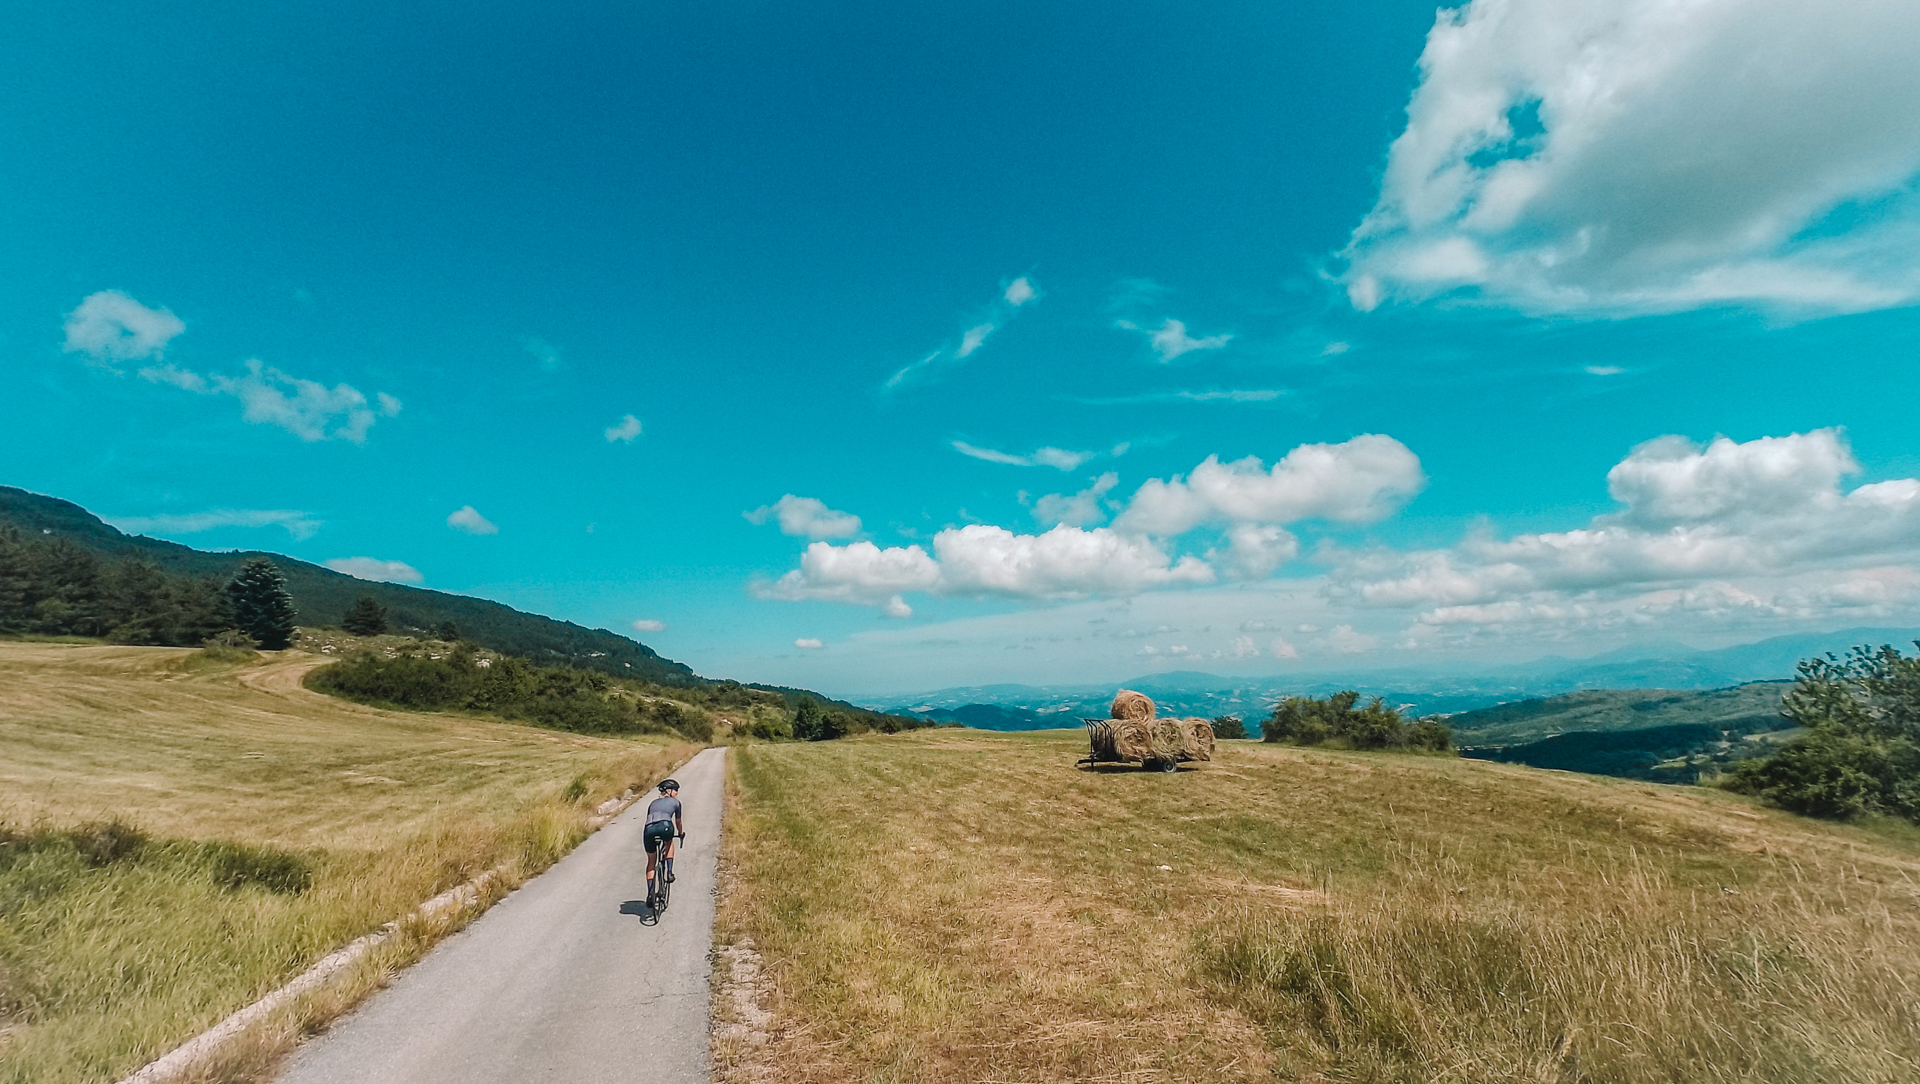 Rennrad Urlaub Ideen